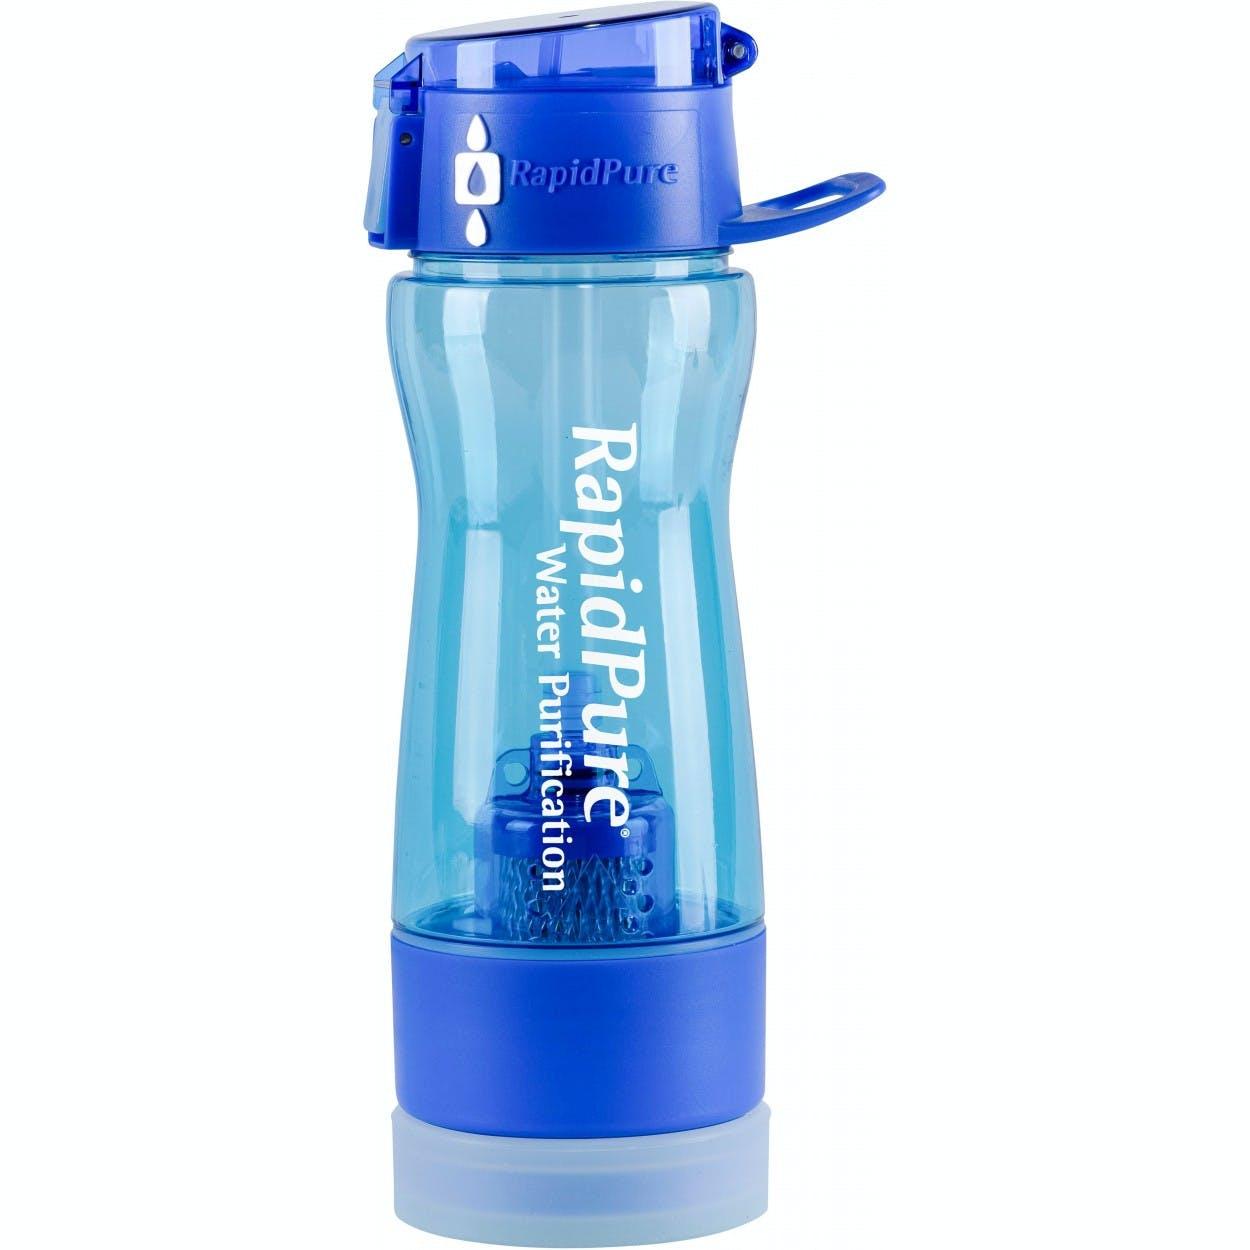 AMK - RapidPure Intrepid Bottle